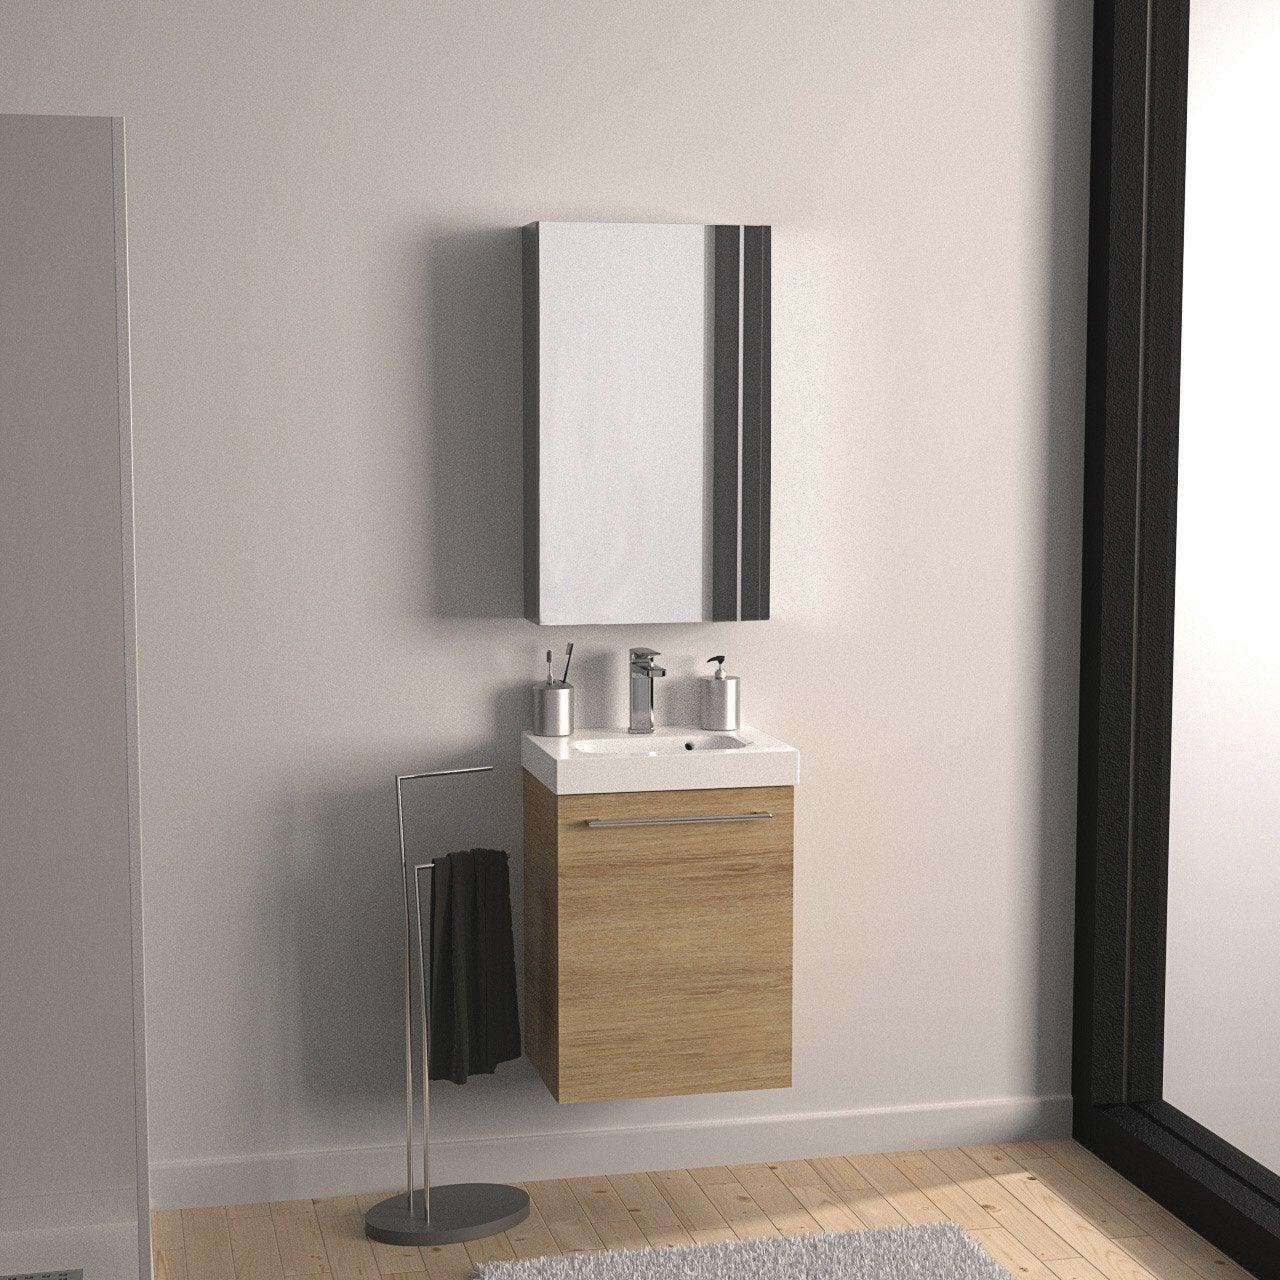 Meuble de salle de bains moins de 60 marron remix leroy merlin - Meuble salle de bain marron ...